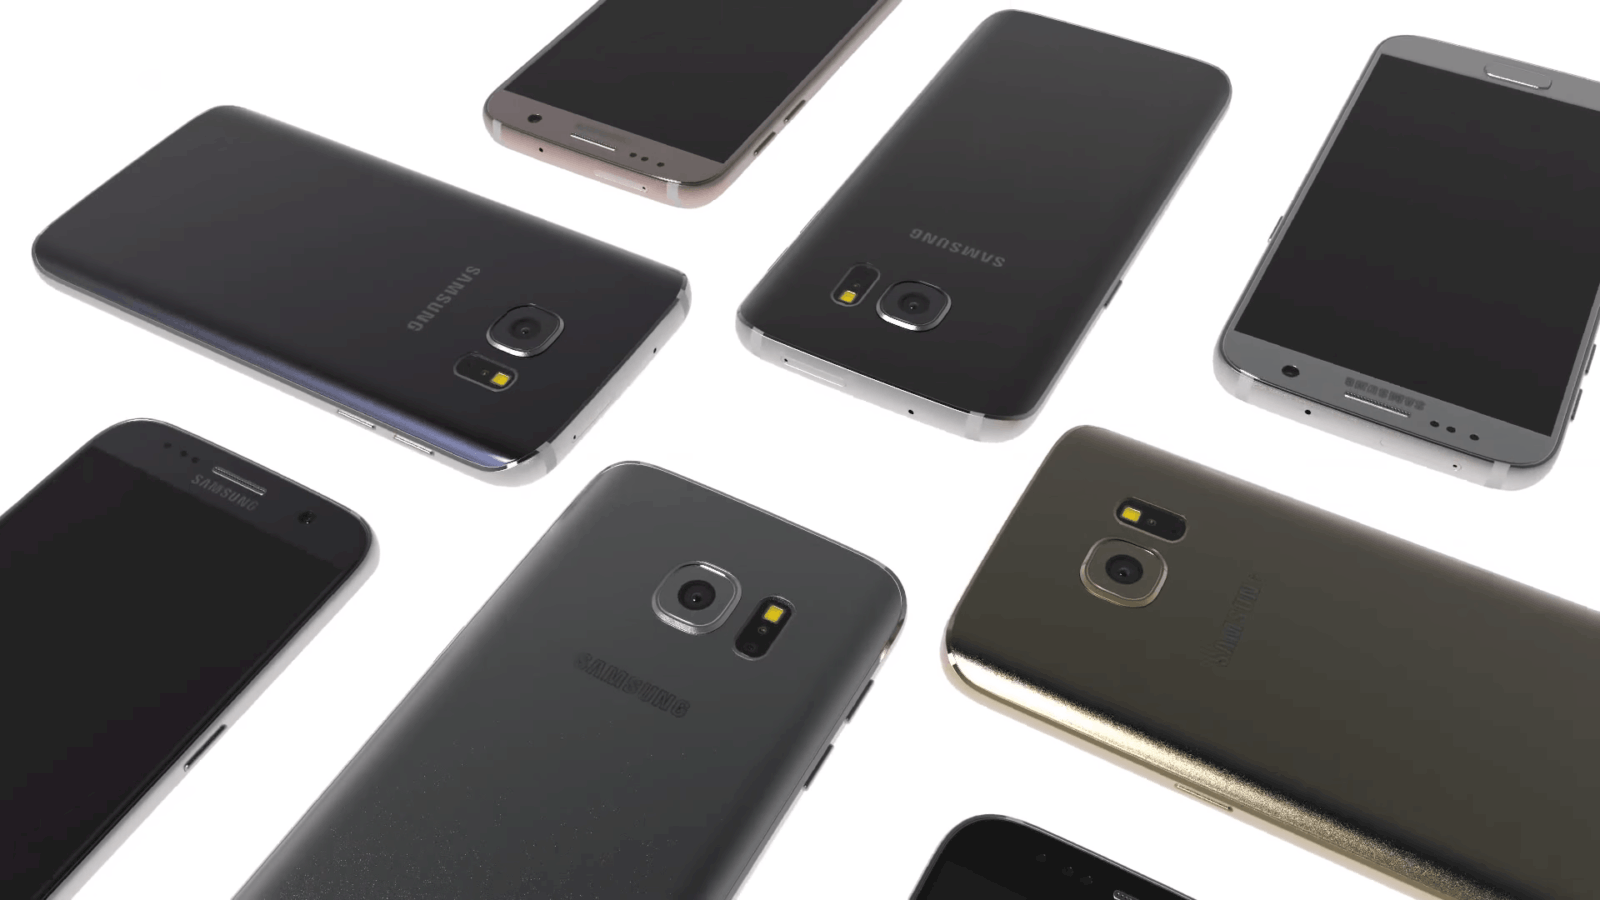 Galaxy S7 Video Based On Leaks